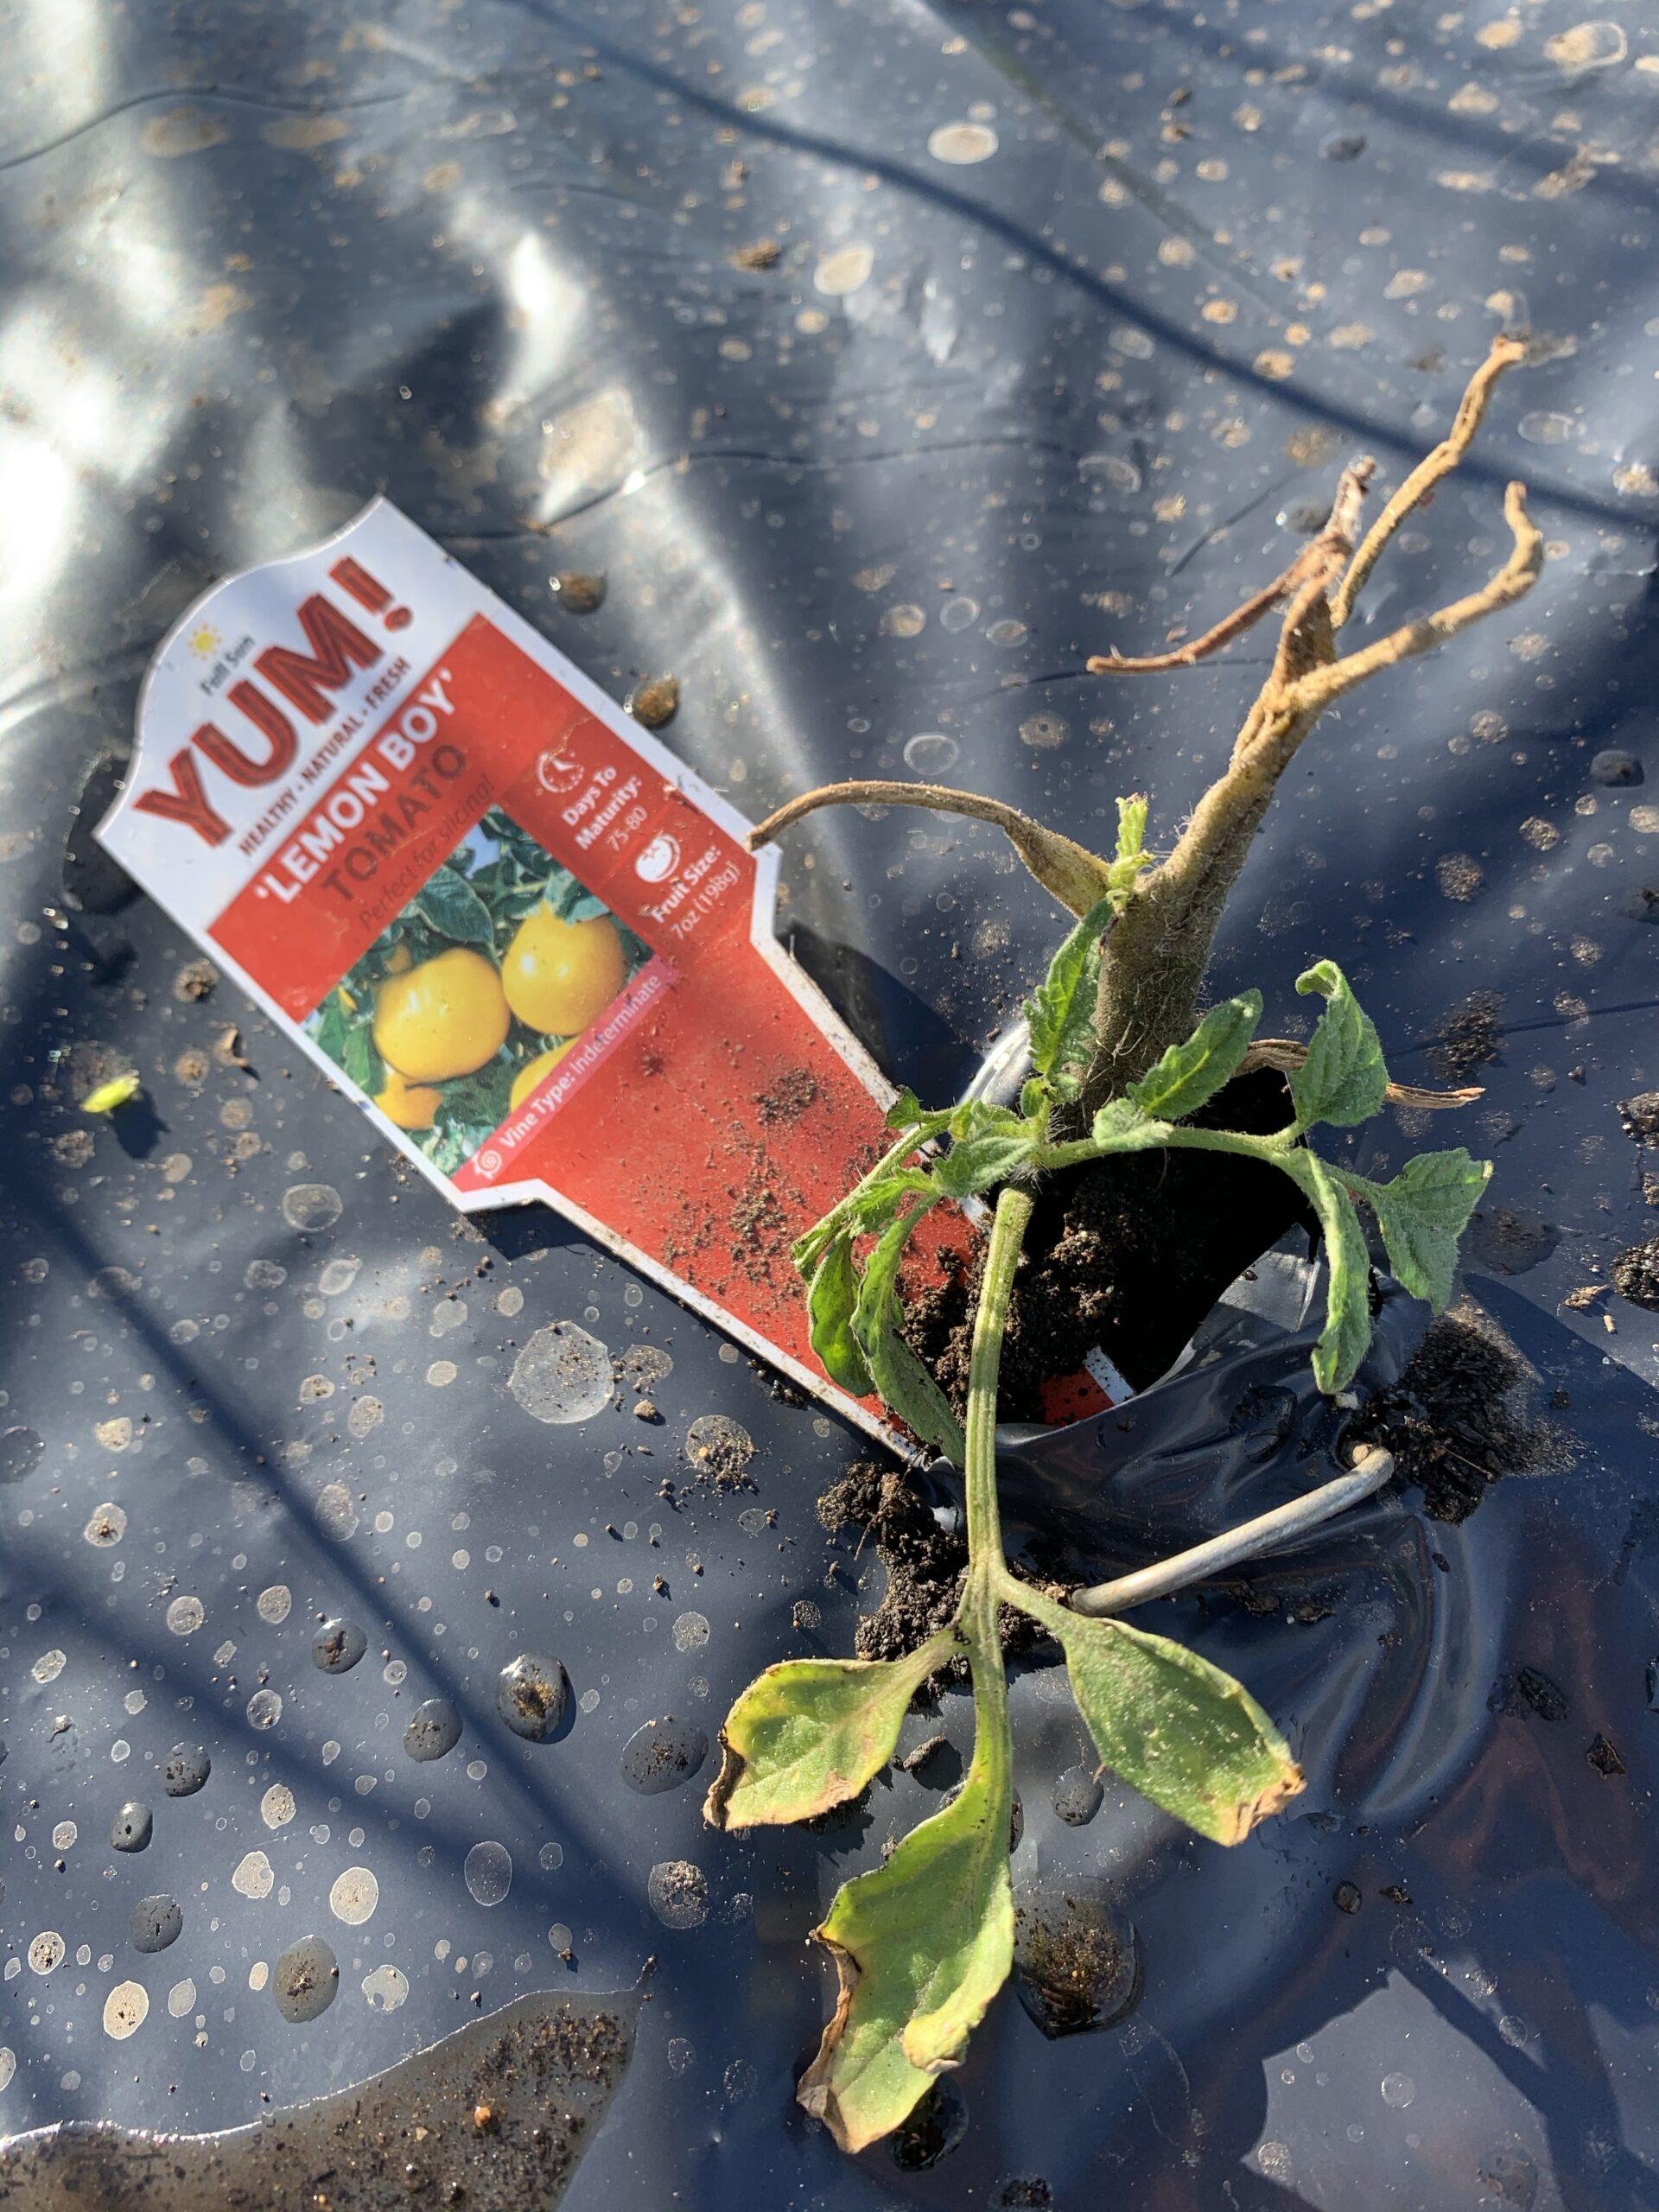 img 5570 scaled Tomato Planting Day